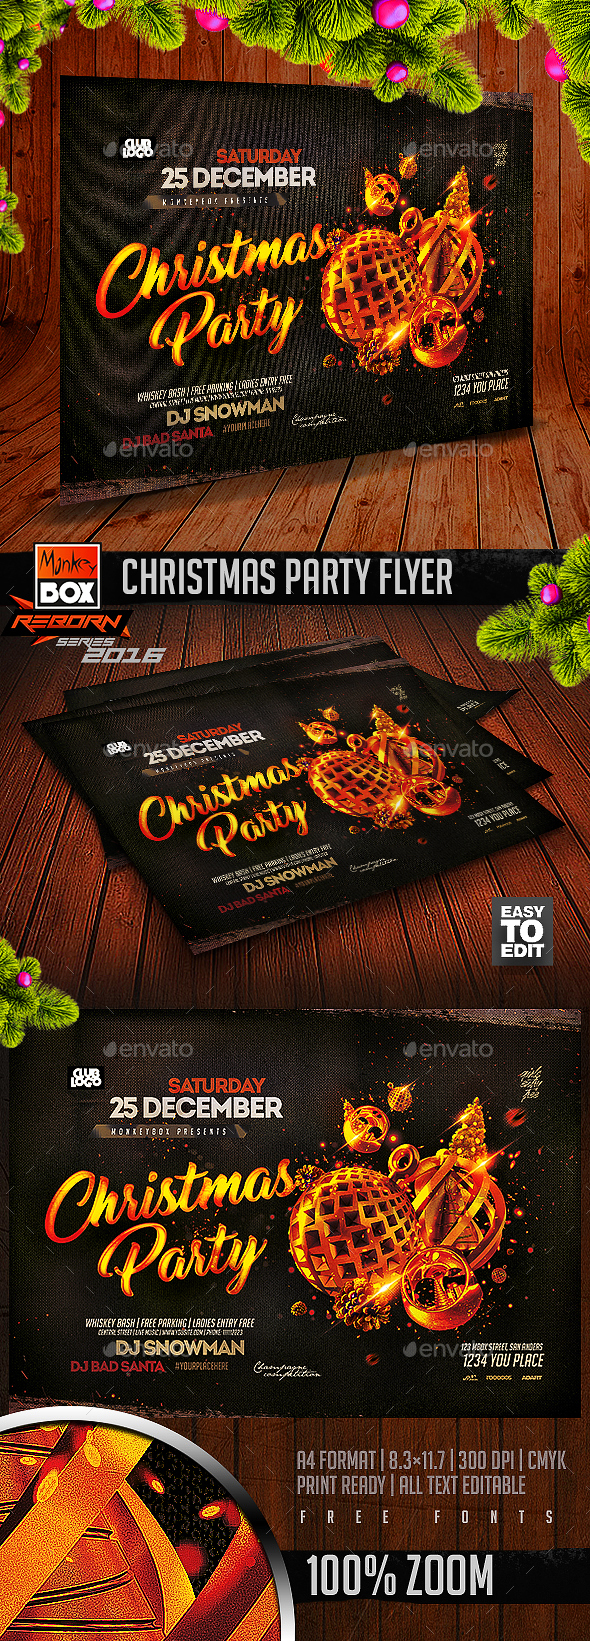 Christmas Party Flyer - Flyers Print Templates